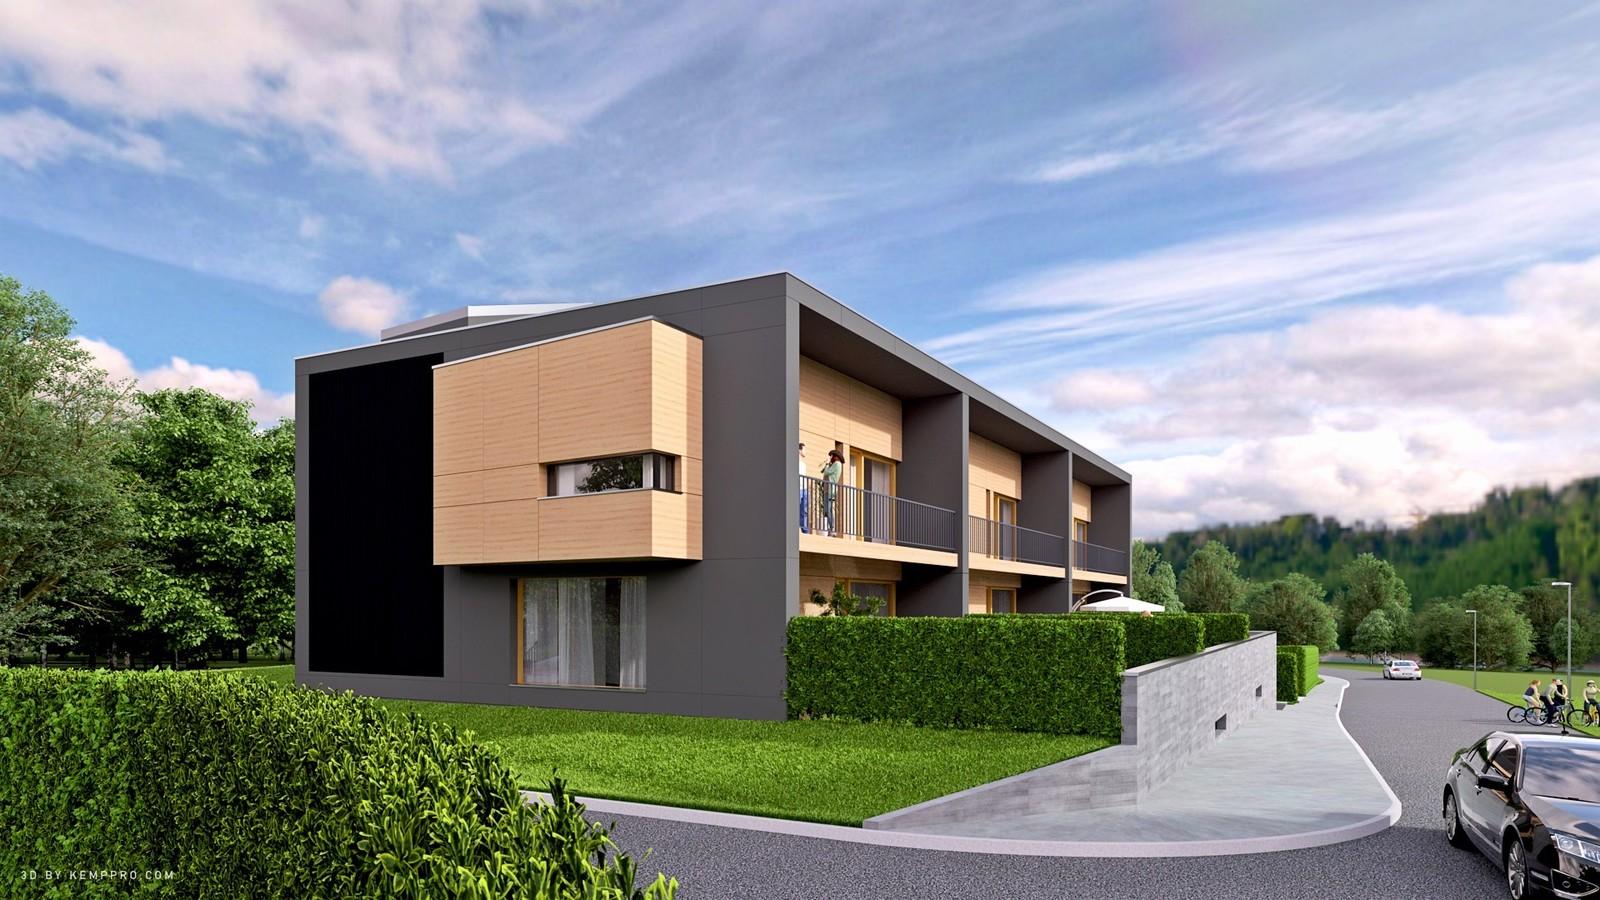 Architect - Braa Geneva  03 Exterior SW Corner close 03 B  KP webpage of project: http://www.kemppro.com/KP_3D_communication_3_Villas_Veyrier.html